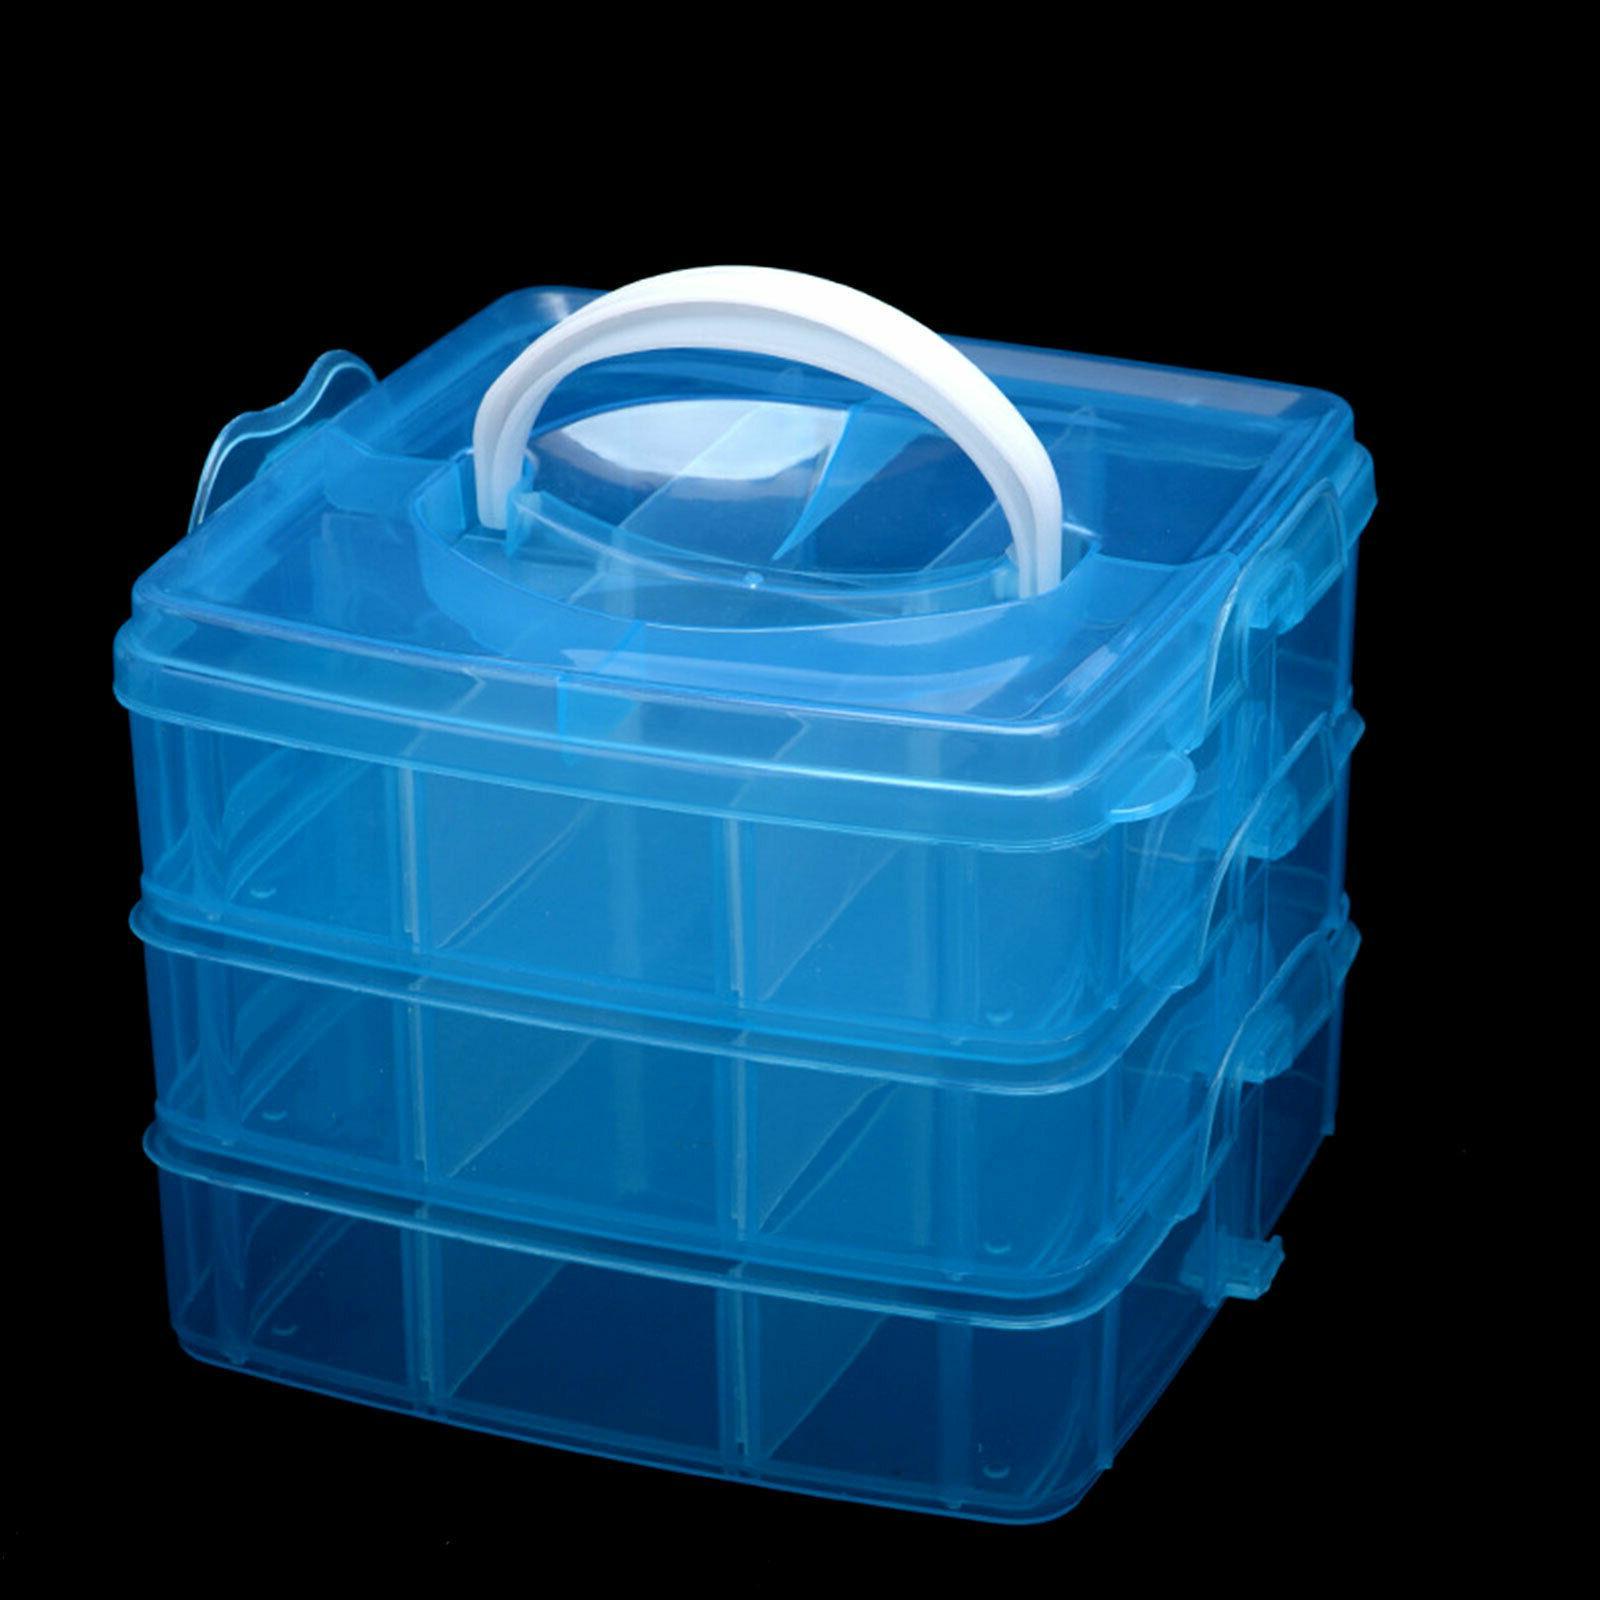 Blue Screws Jewelry Beads Box Crafts Organizer Container Case